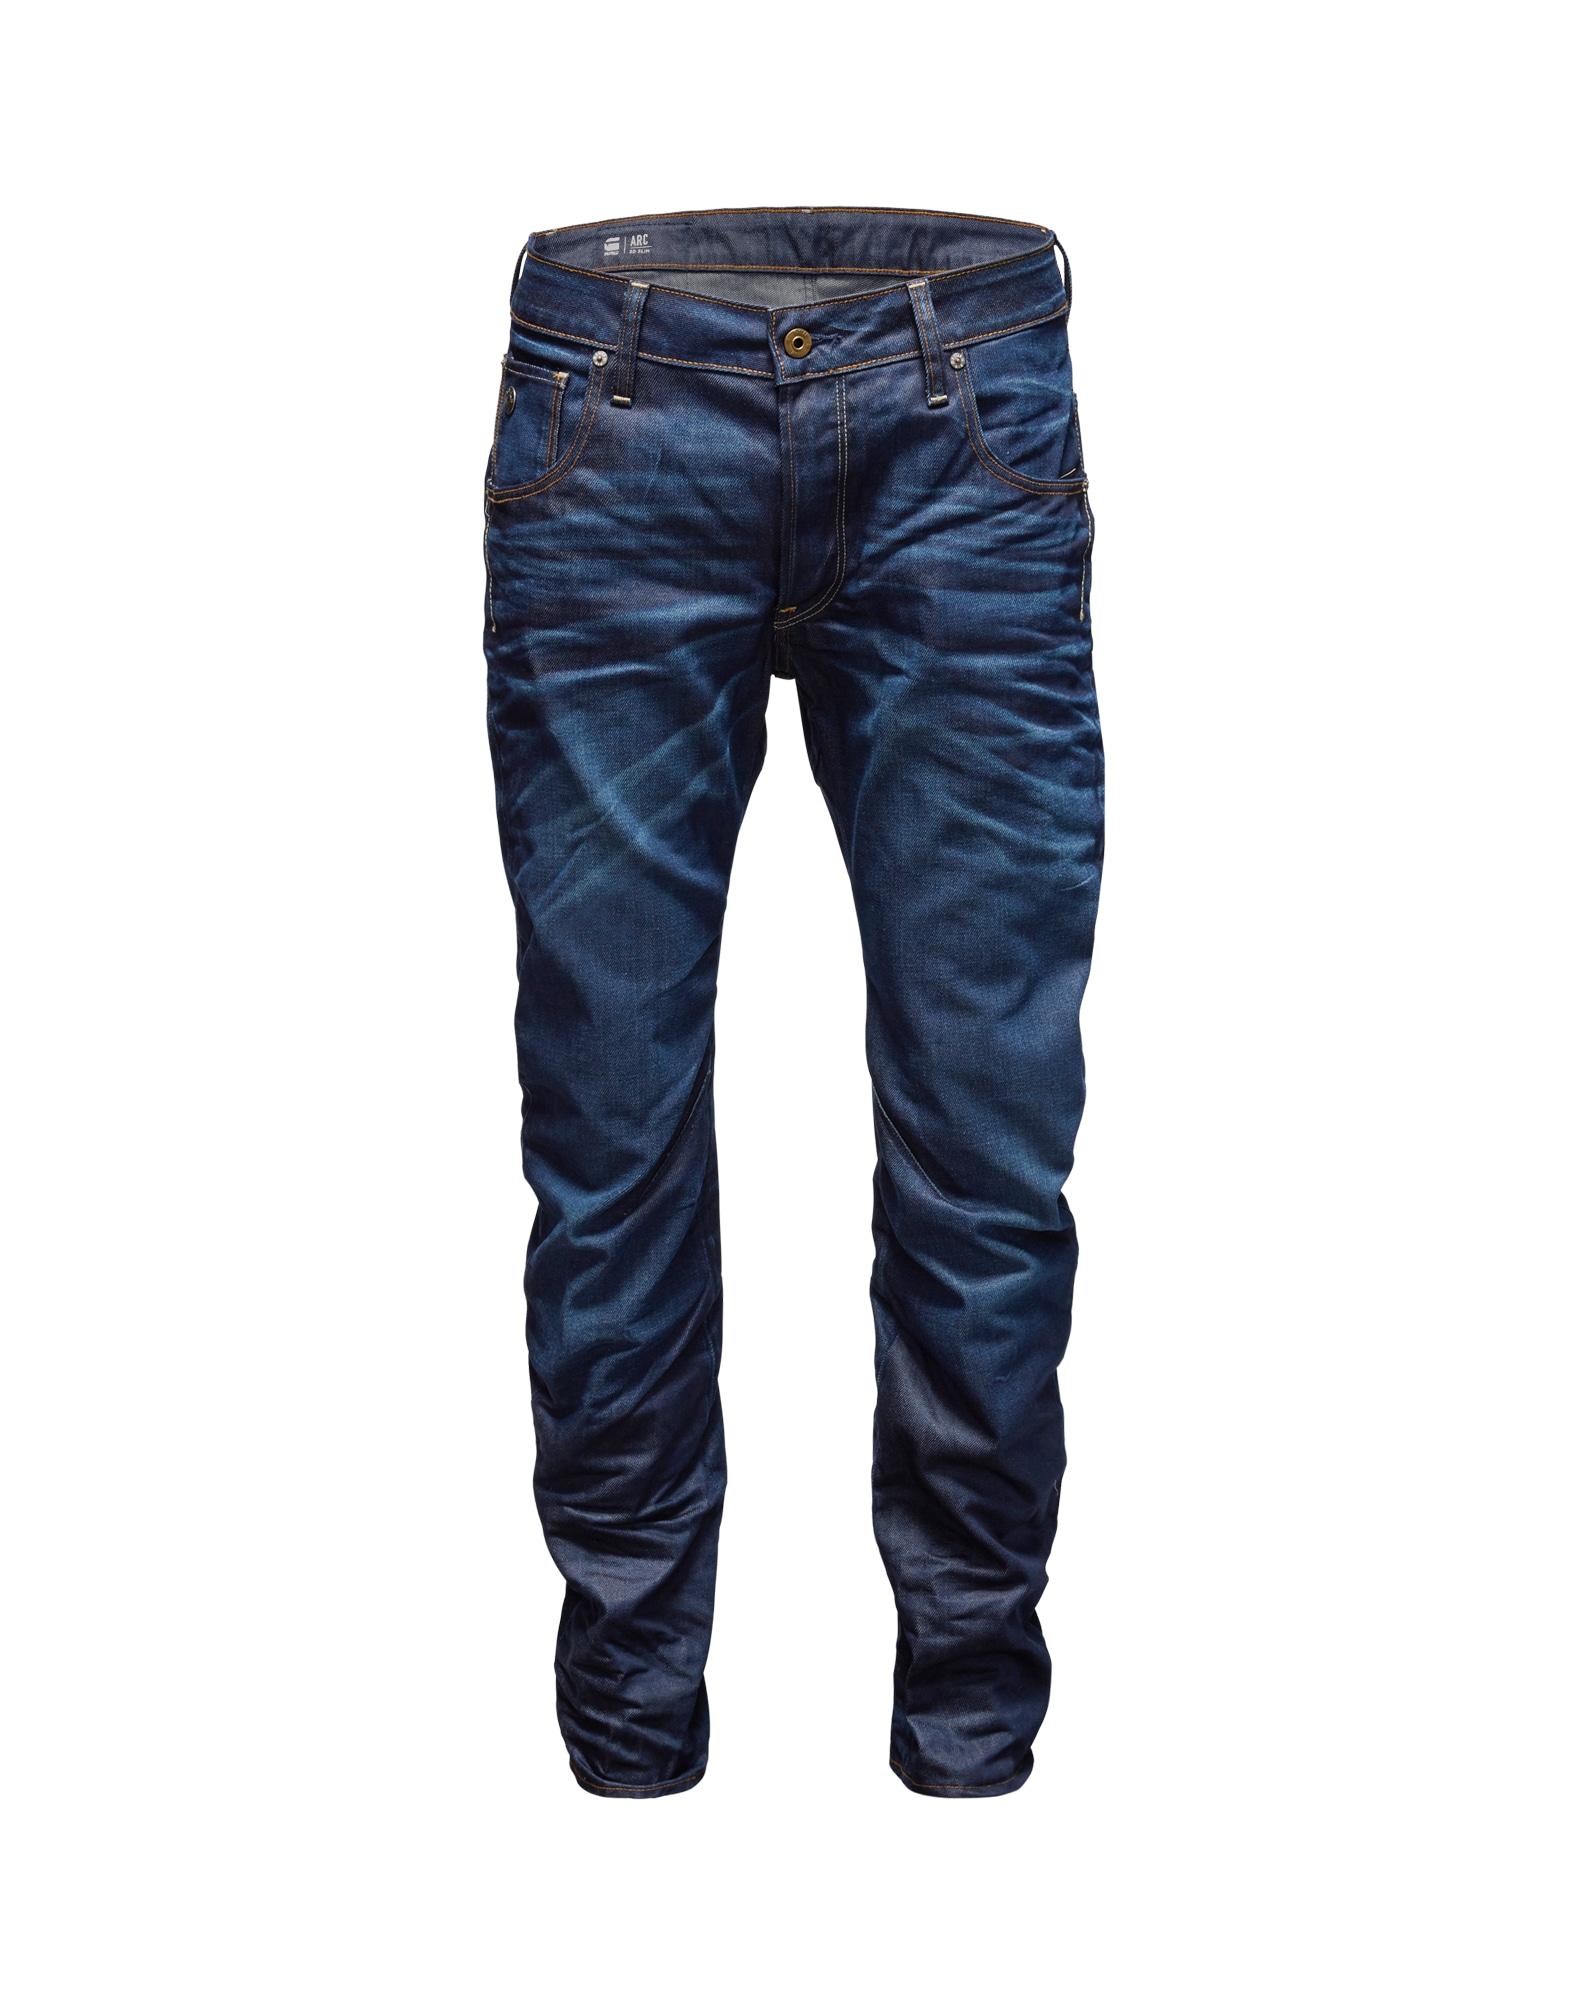 G-Star RAW Džinsai 'Arc 3D' mėlyna / tamsiai mėlyna